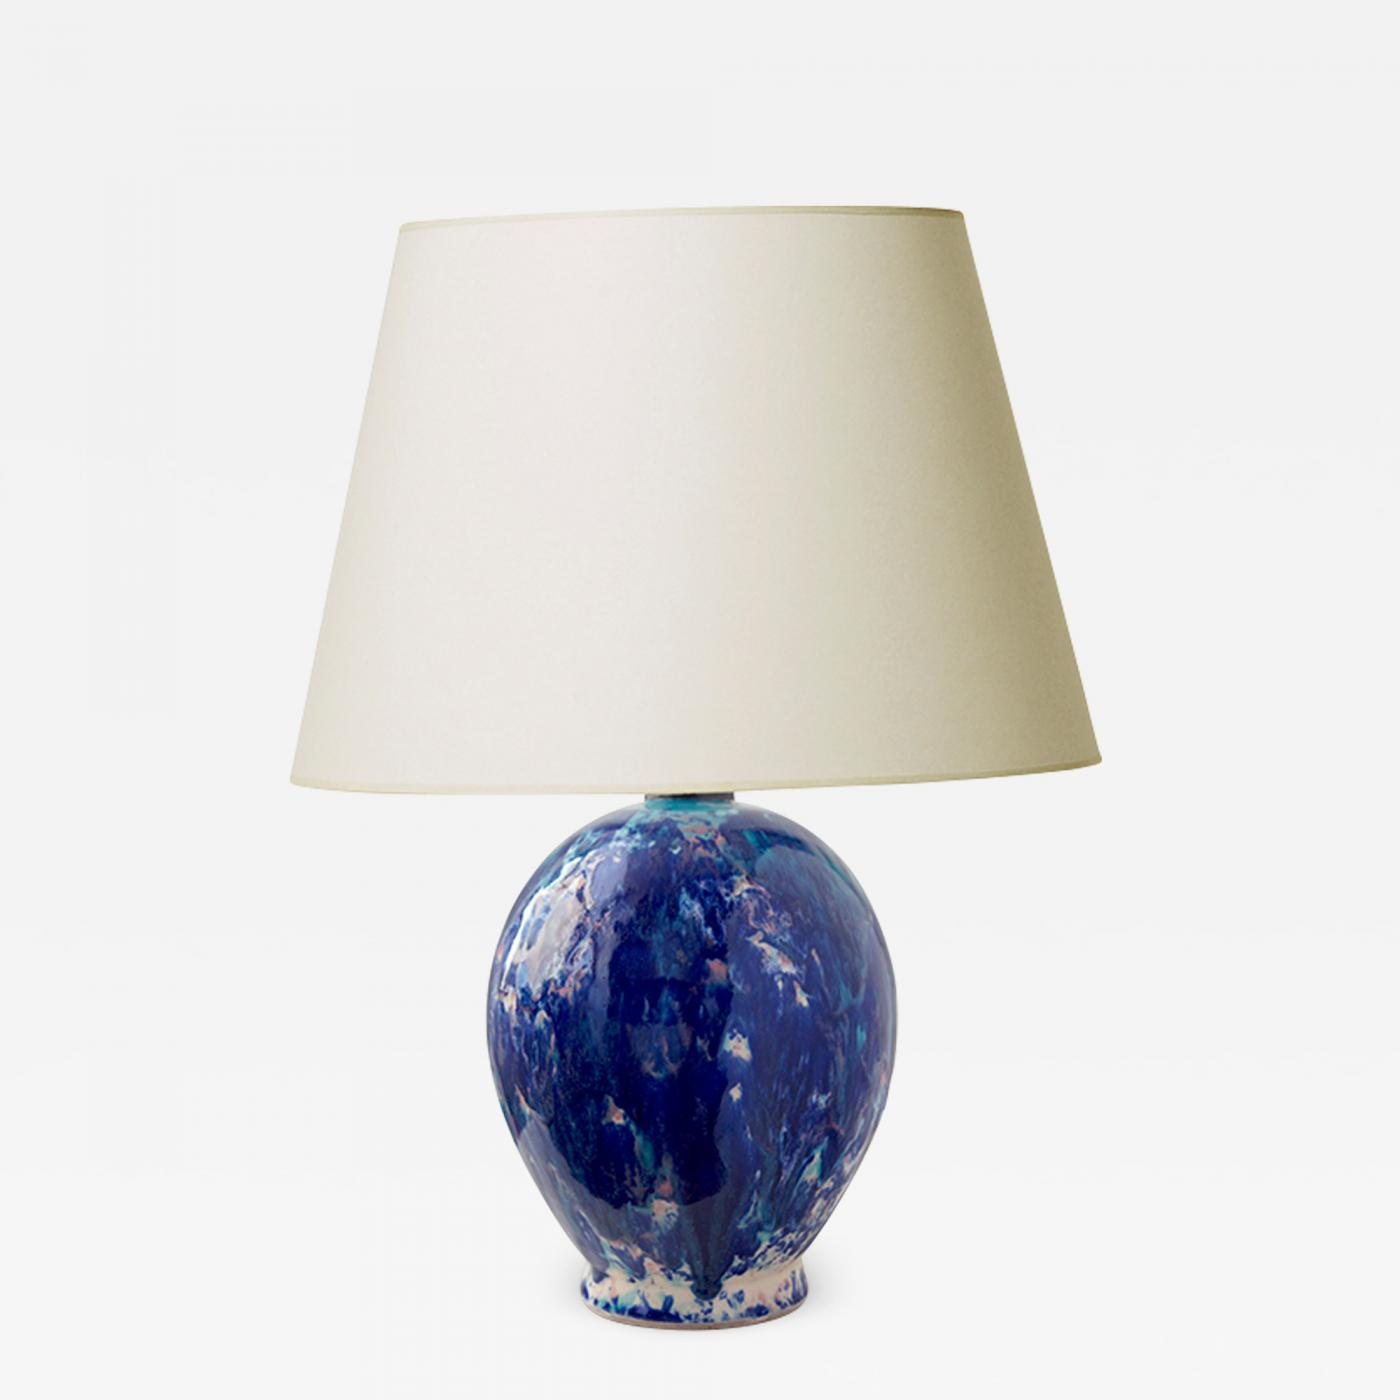 Primavera Atelier Du Printemps Art Deco Table Glazed In Vivid Blues